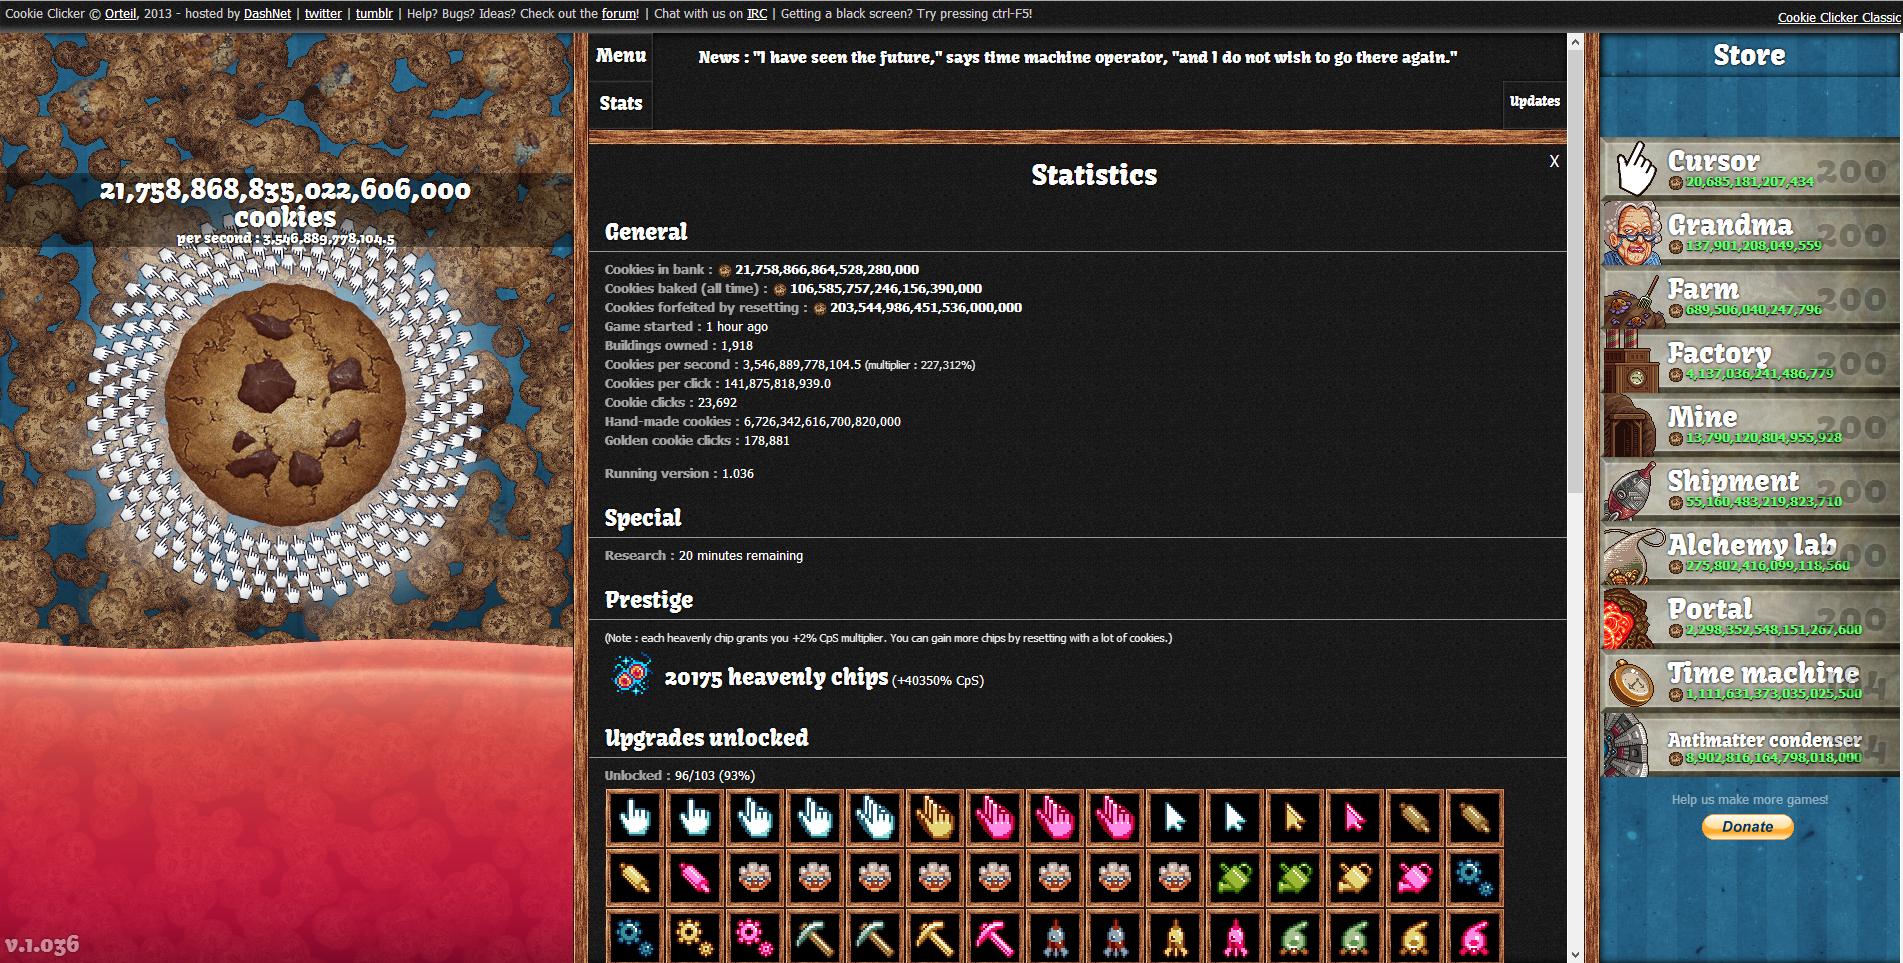 1 0 Update | Cookie Clicker Wiki | FANDOM powered by Wikia